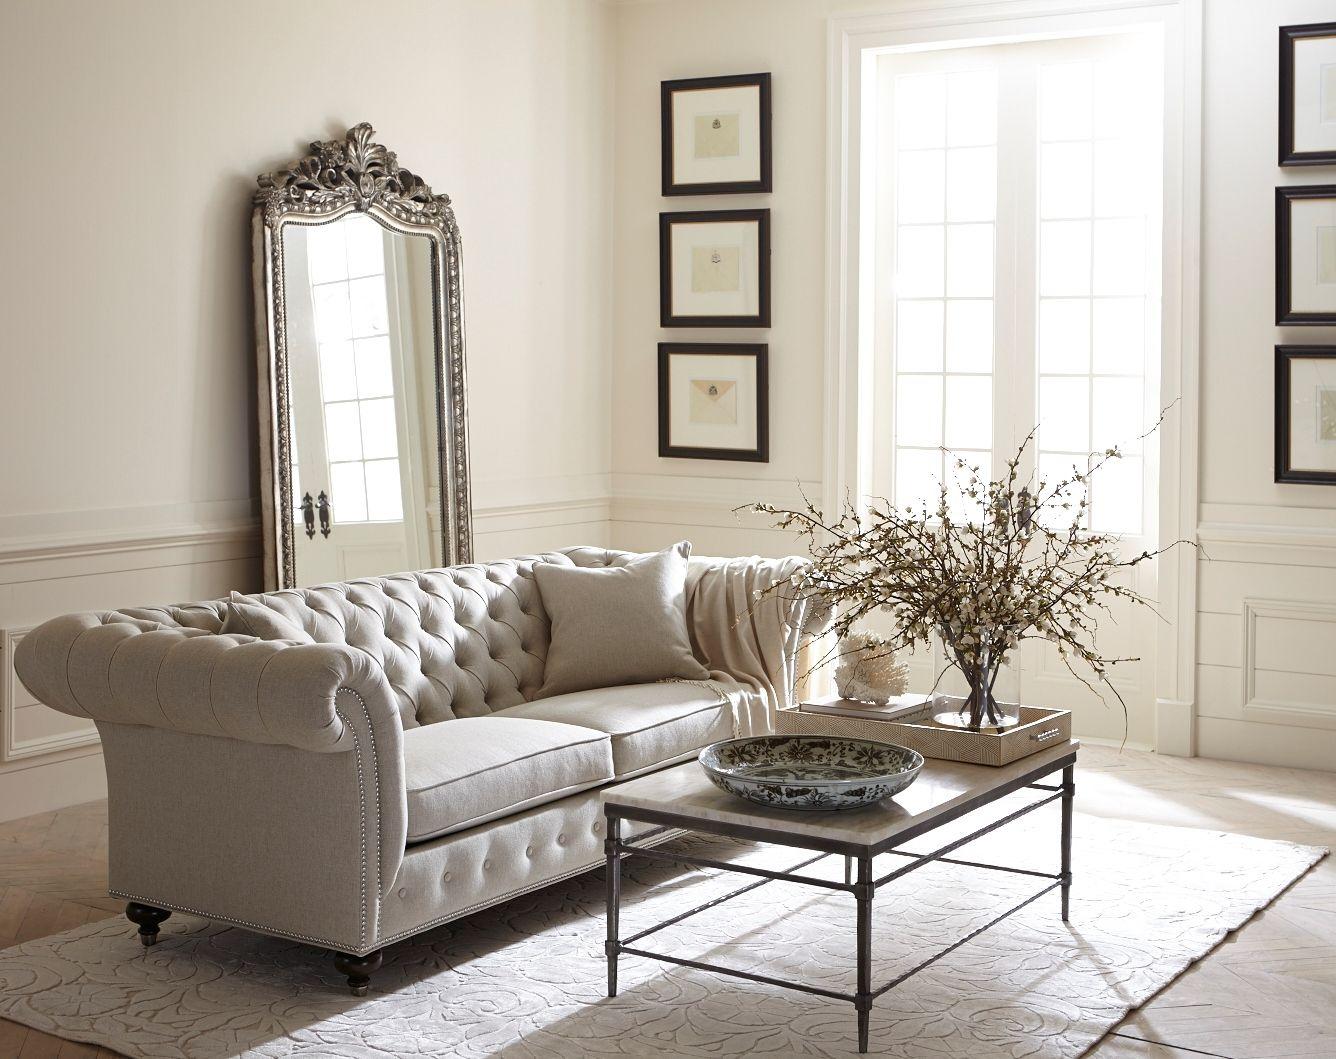 Mansfield Sofa Living Room SofaLiving IdeasLiving